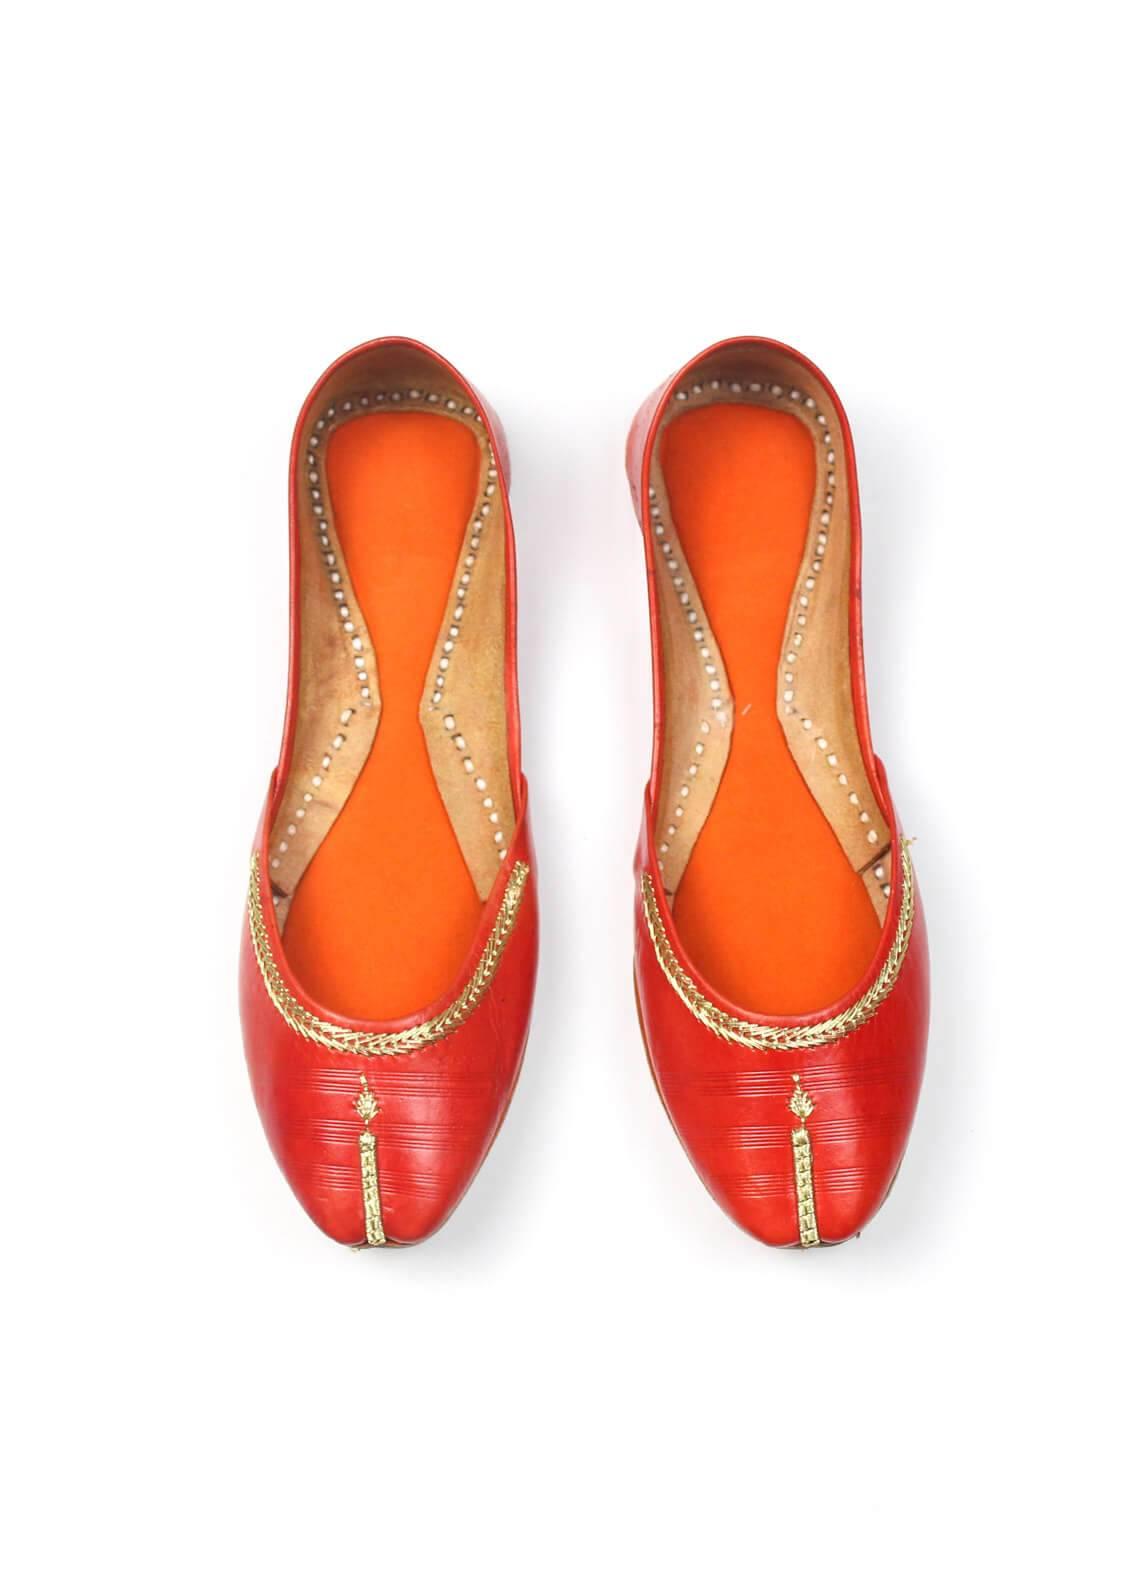 Silk Avenue Khussa Style Leather Flat Shoes SAF018-Orange